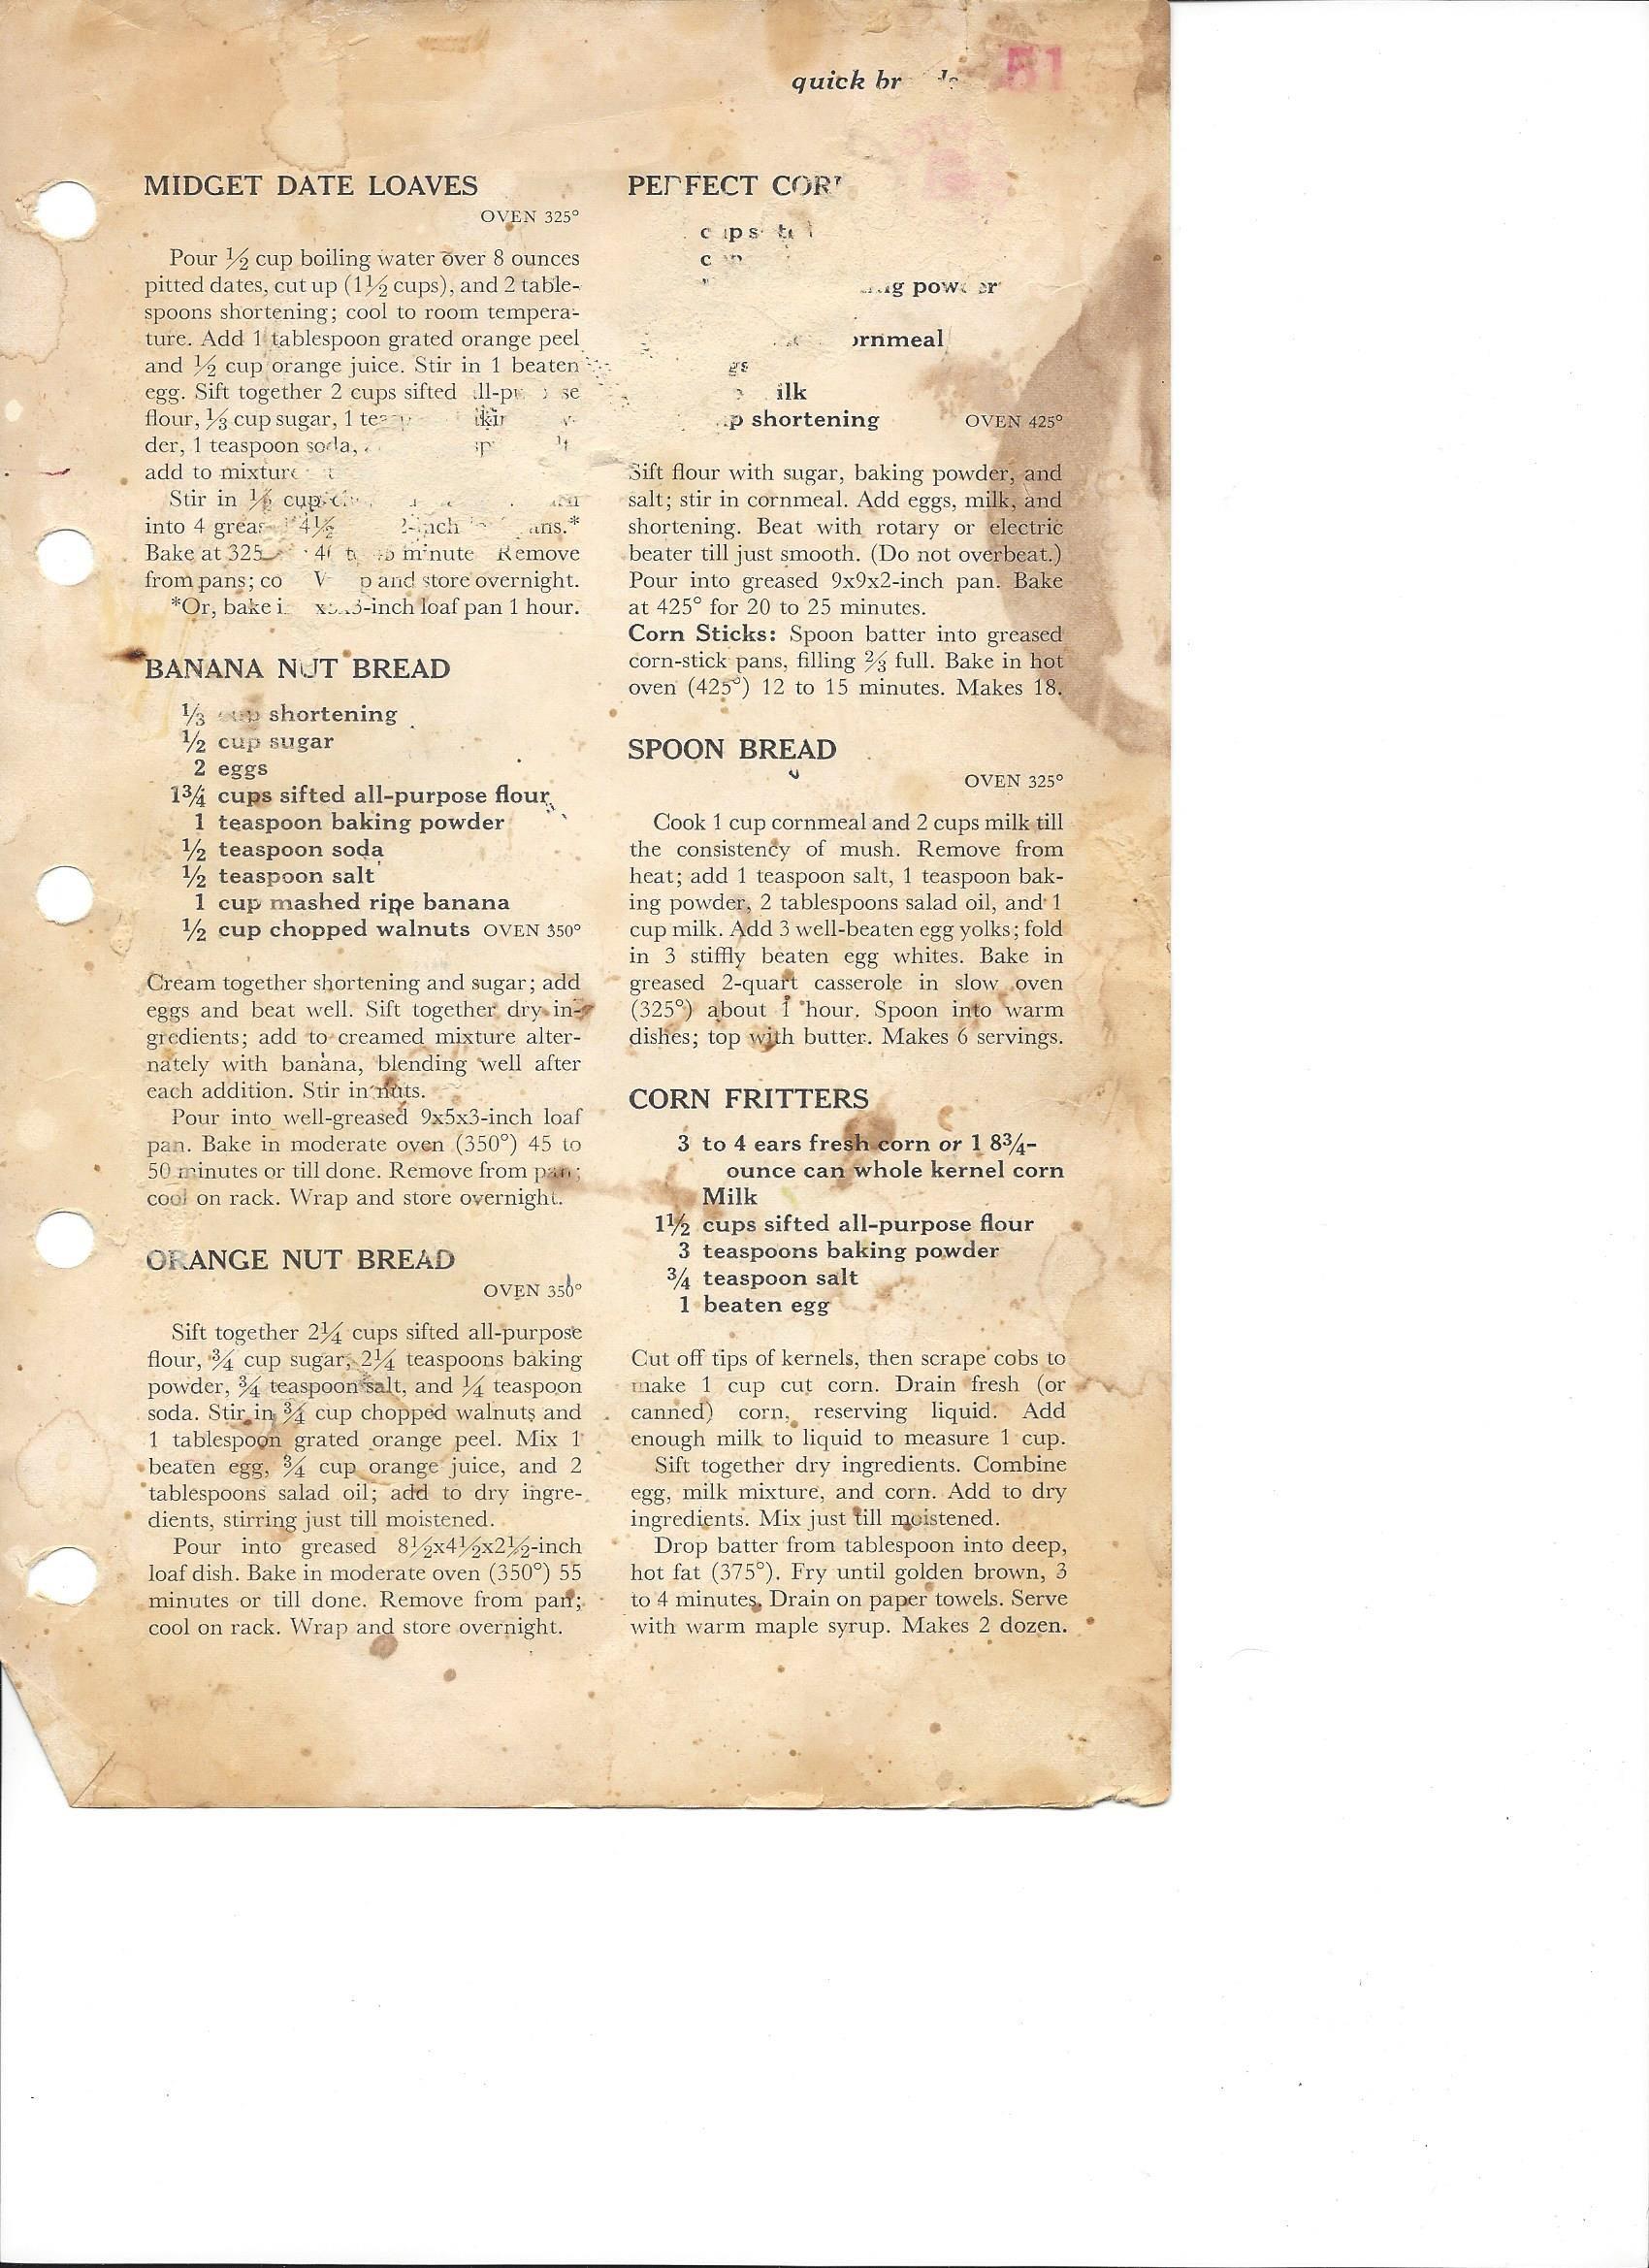 eacdb71803d1c2e1829aa9874d0ae035 - Better Homes And Gardens New Cookbook Banana Bread Recipe